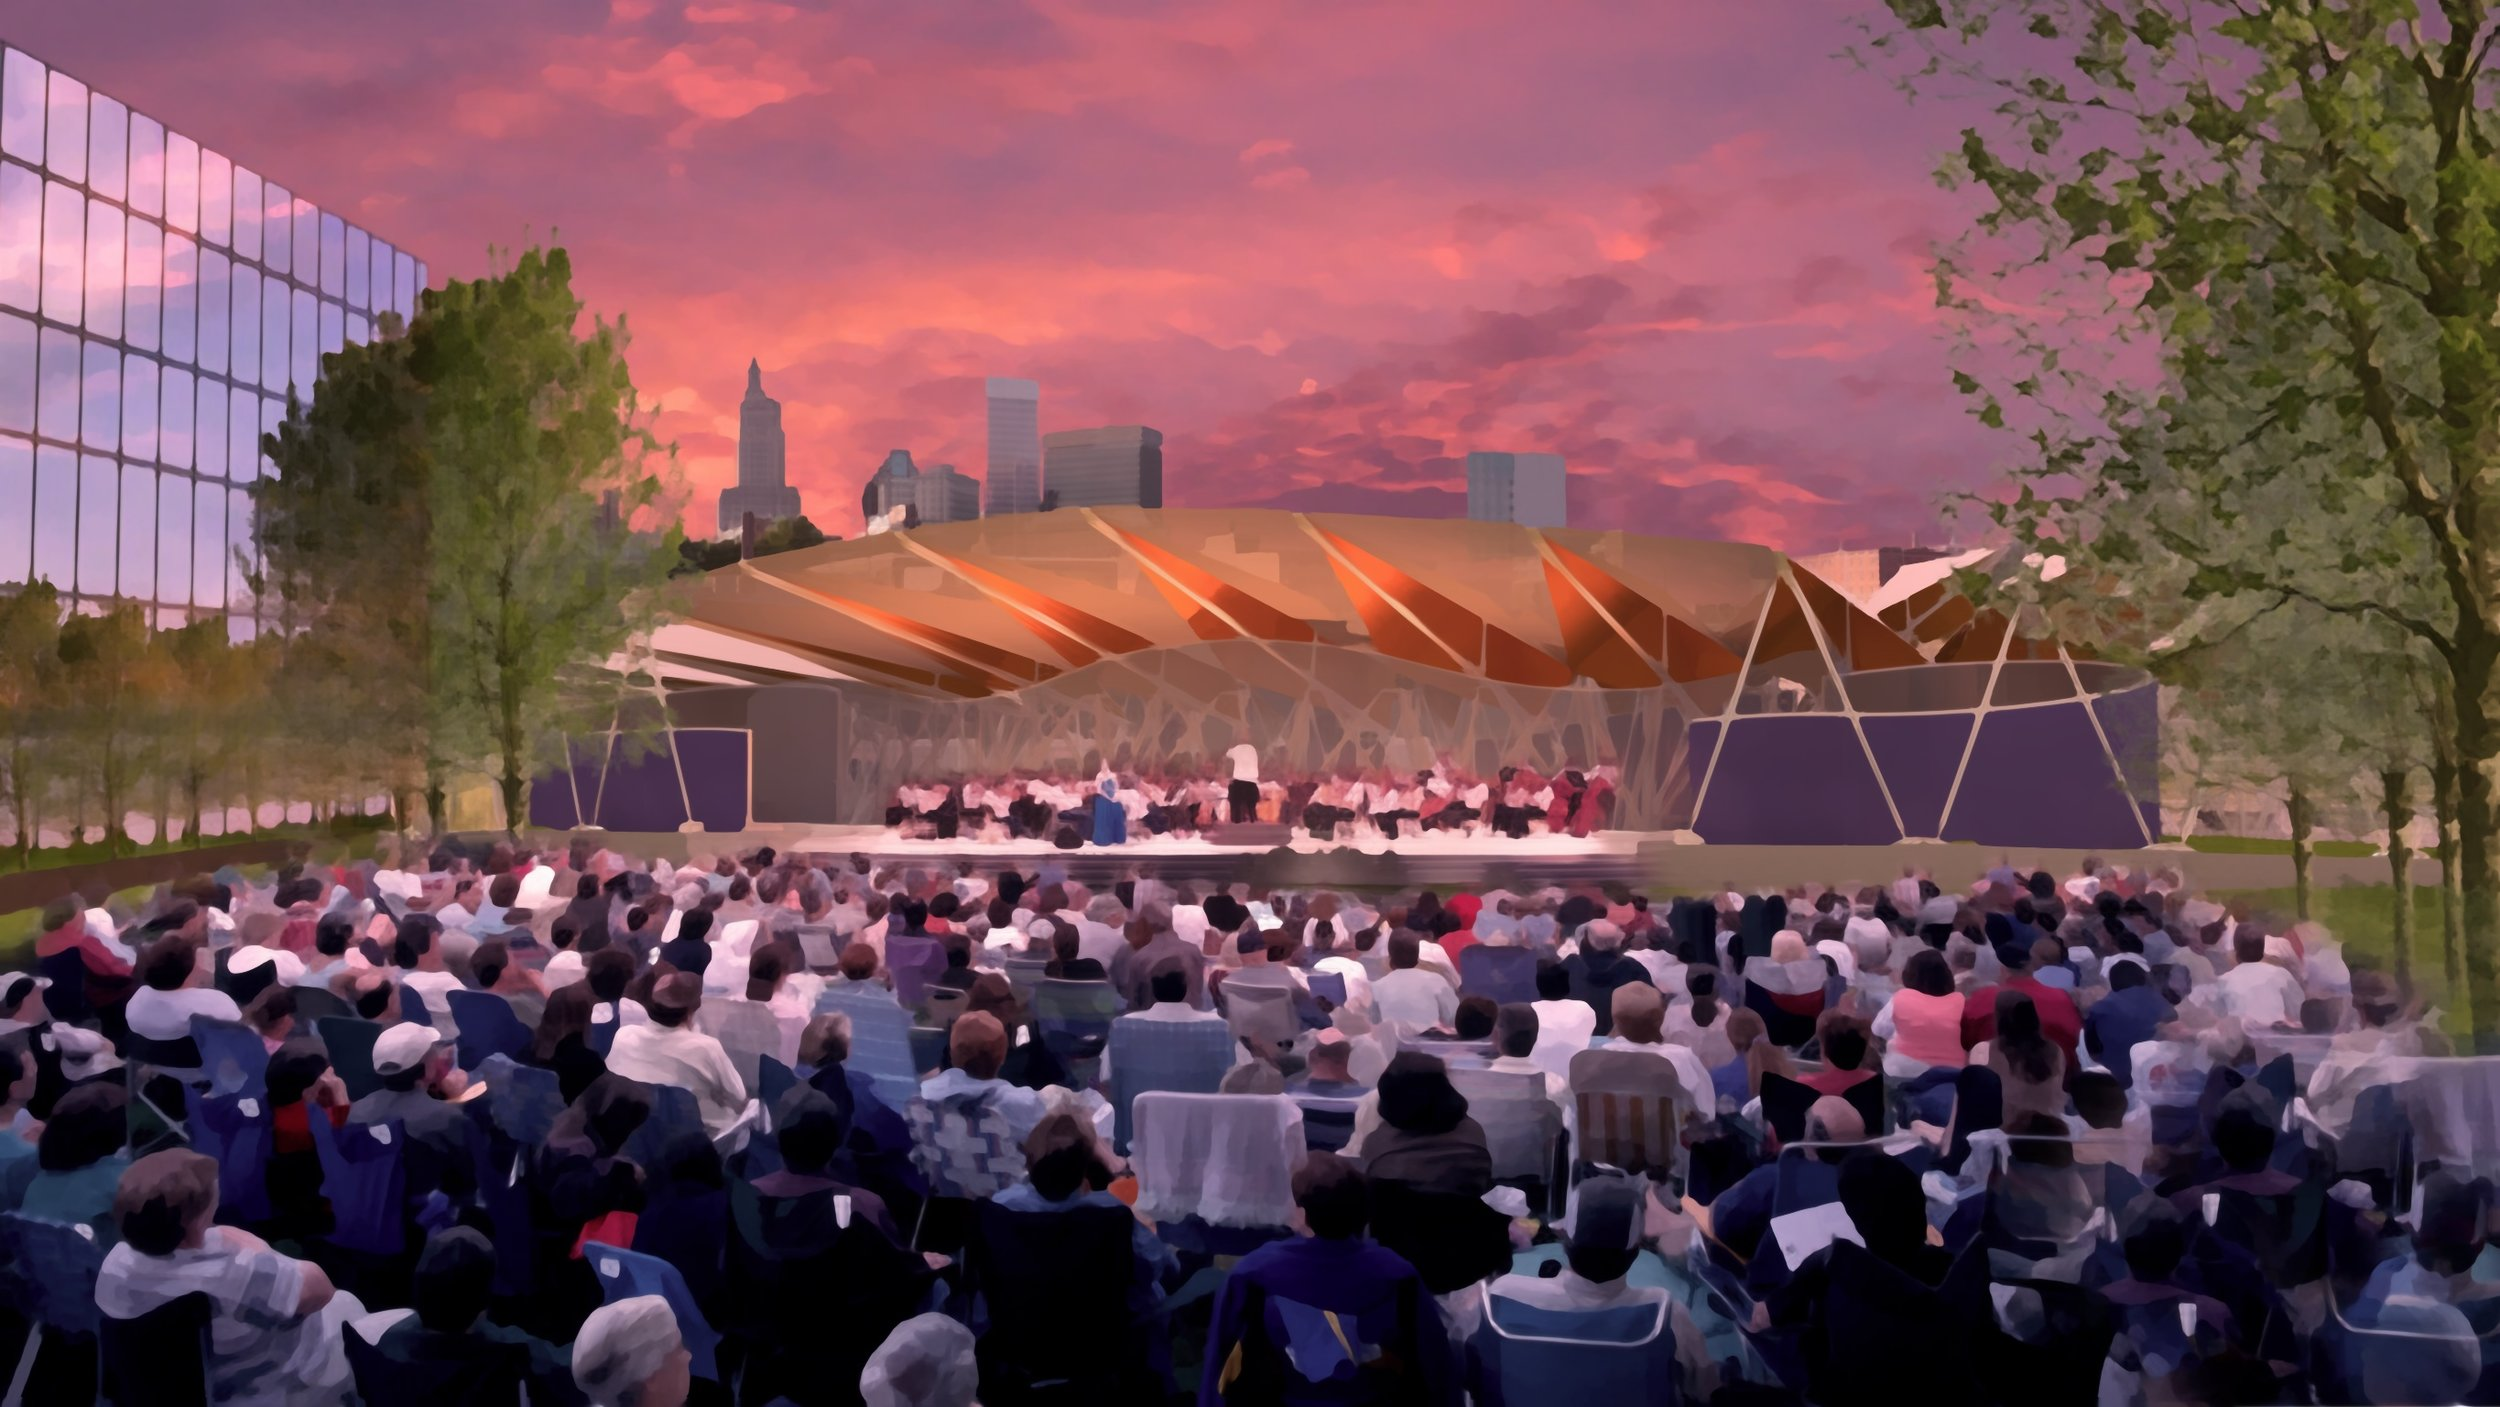 Providence-Park-Pavilions-Epstein-Joslin-04.JPG